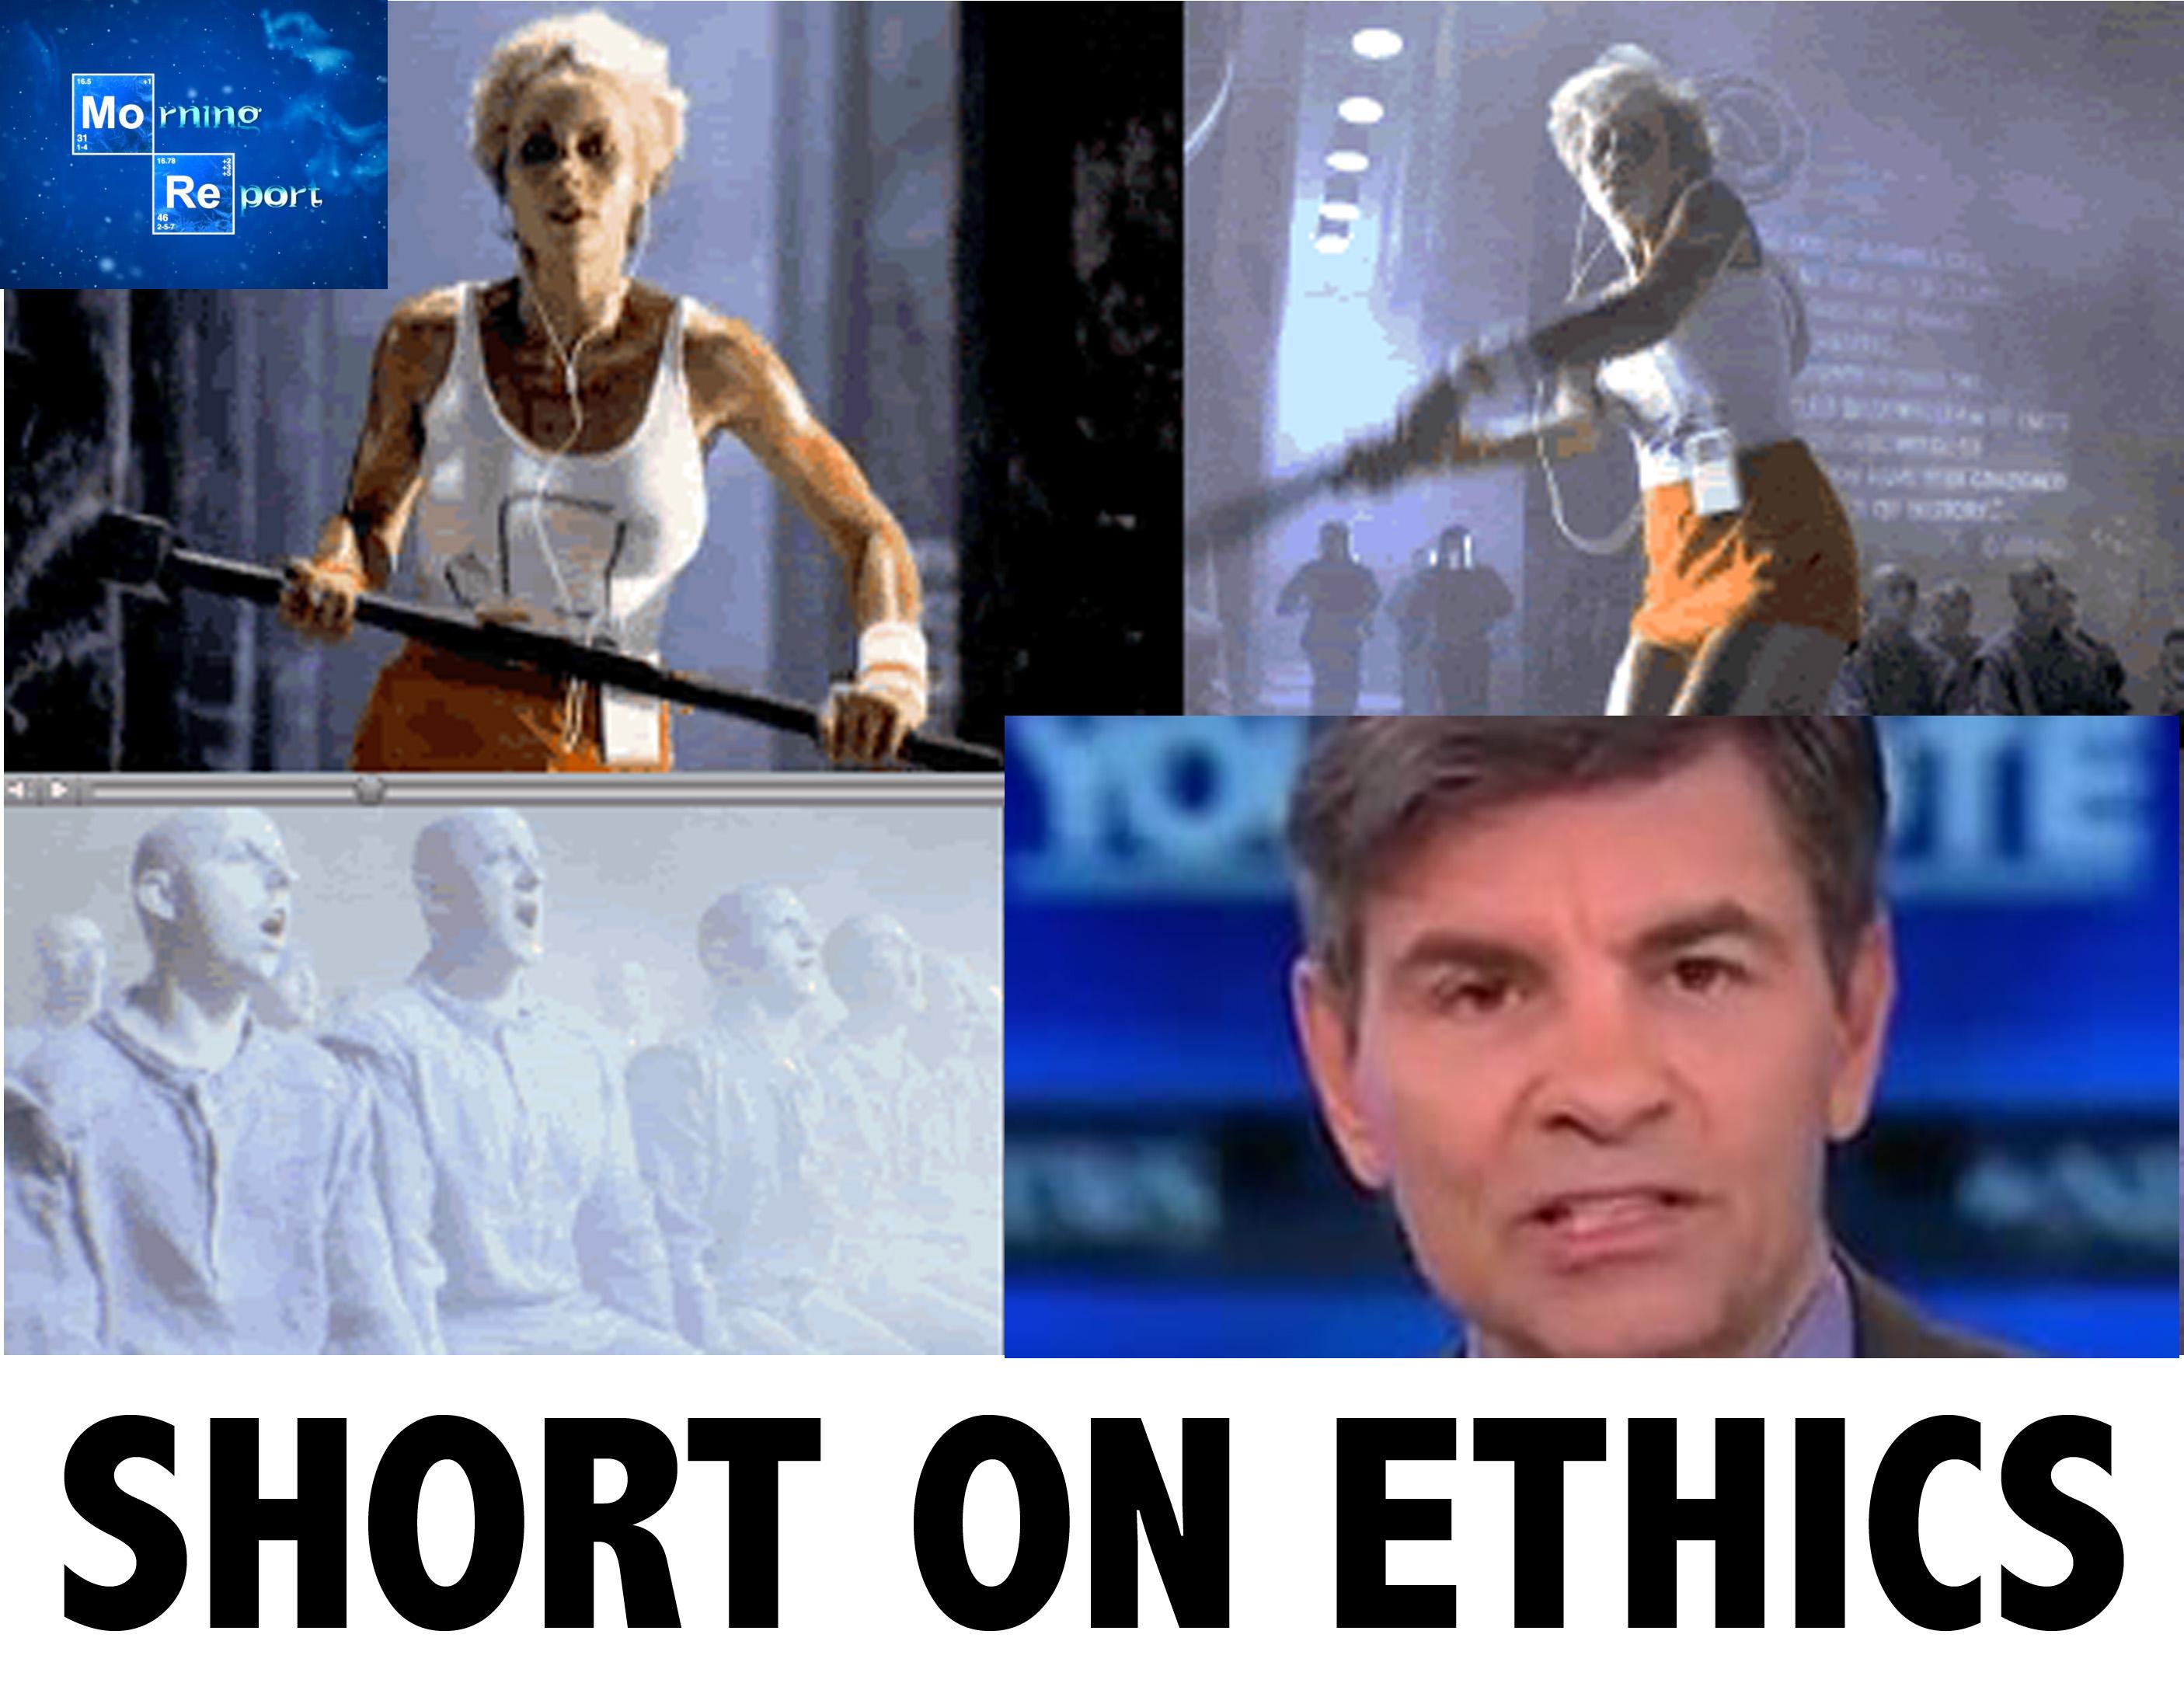 shortonethics.jpg